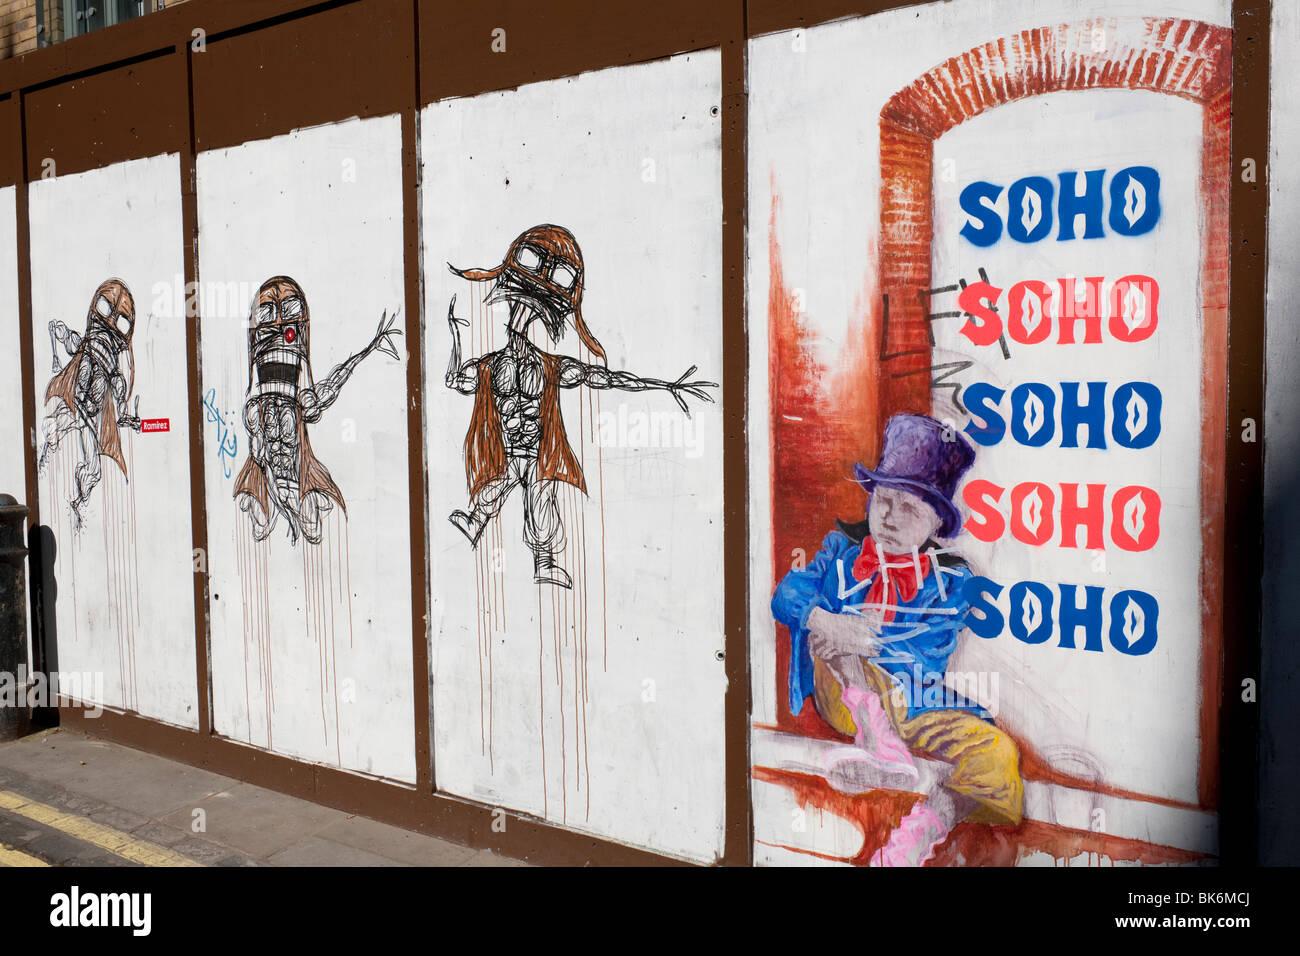 Graffiti on graffiti in London's Soho - Stock Image